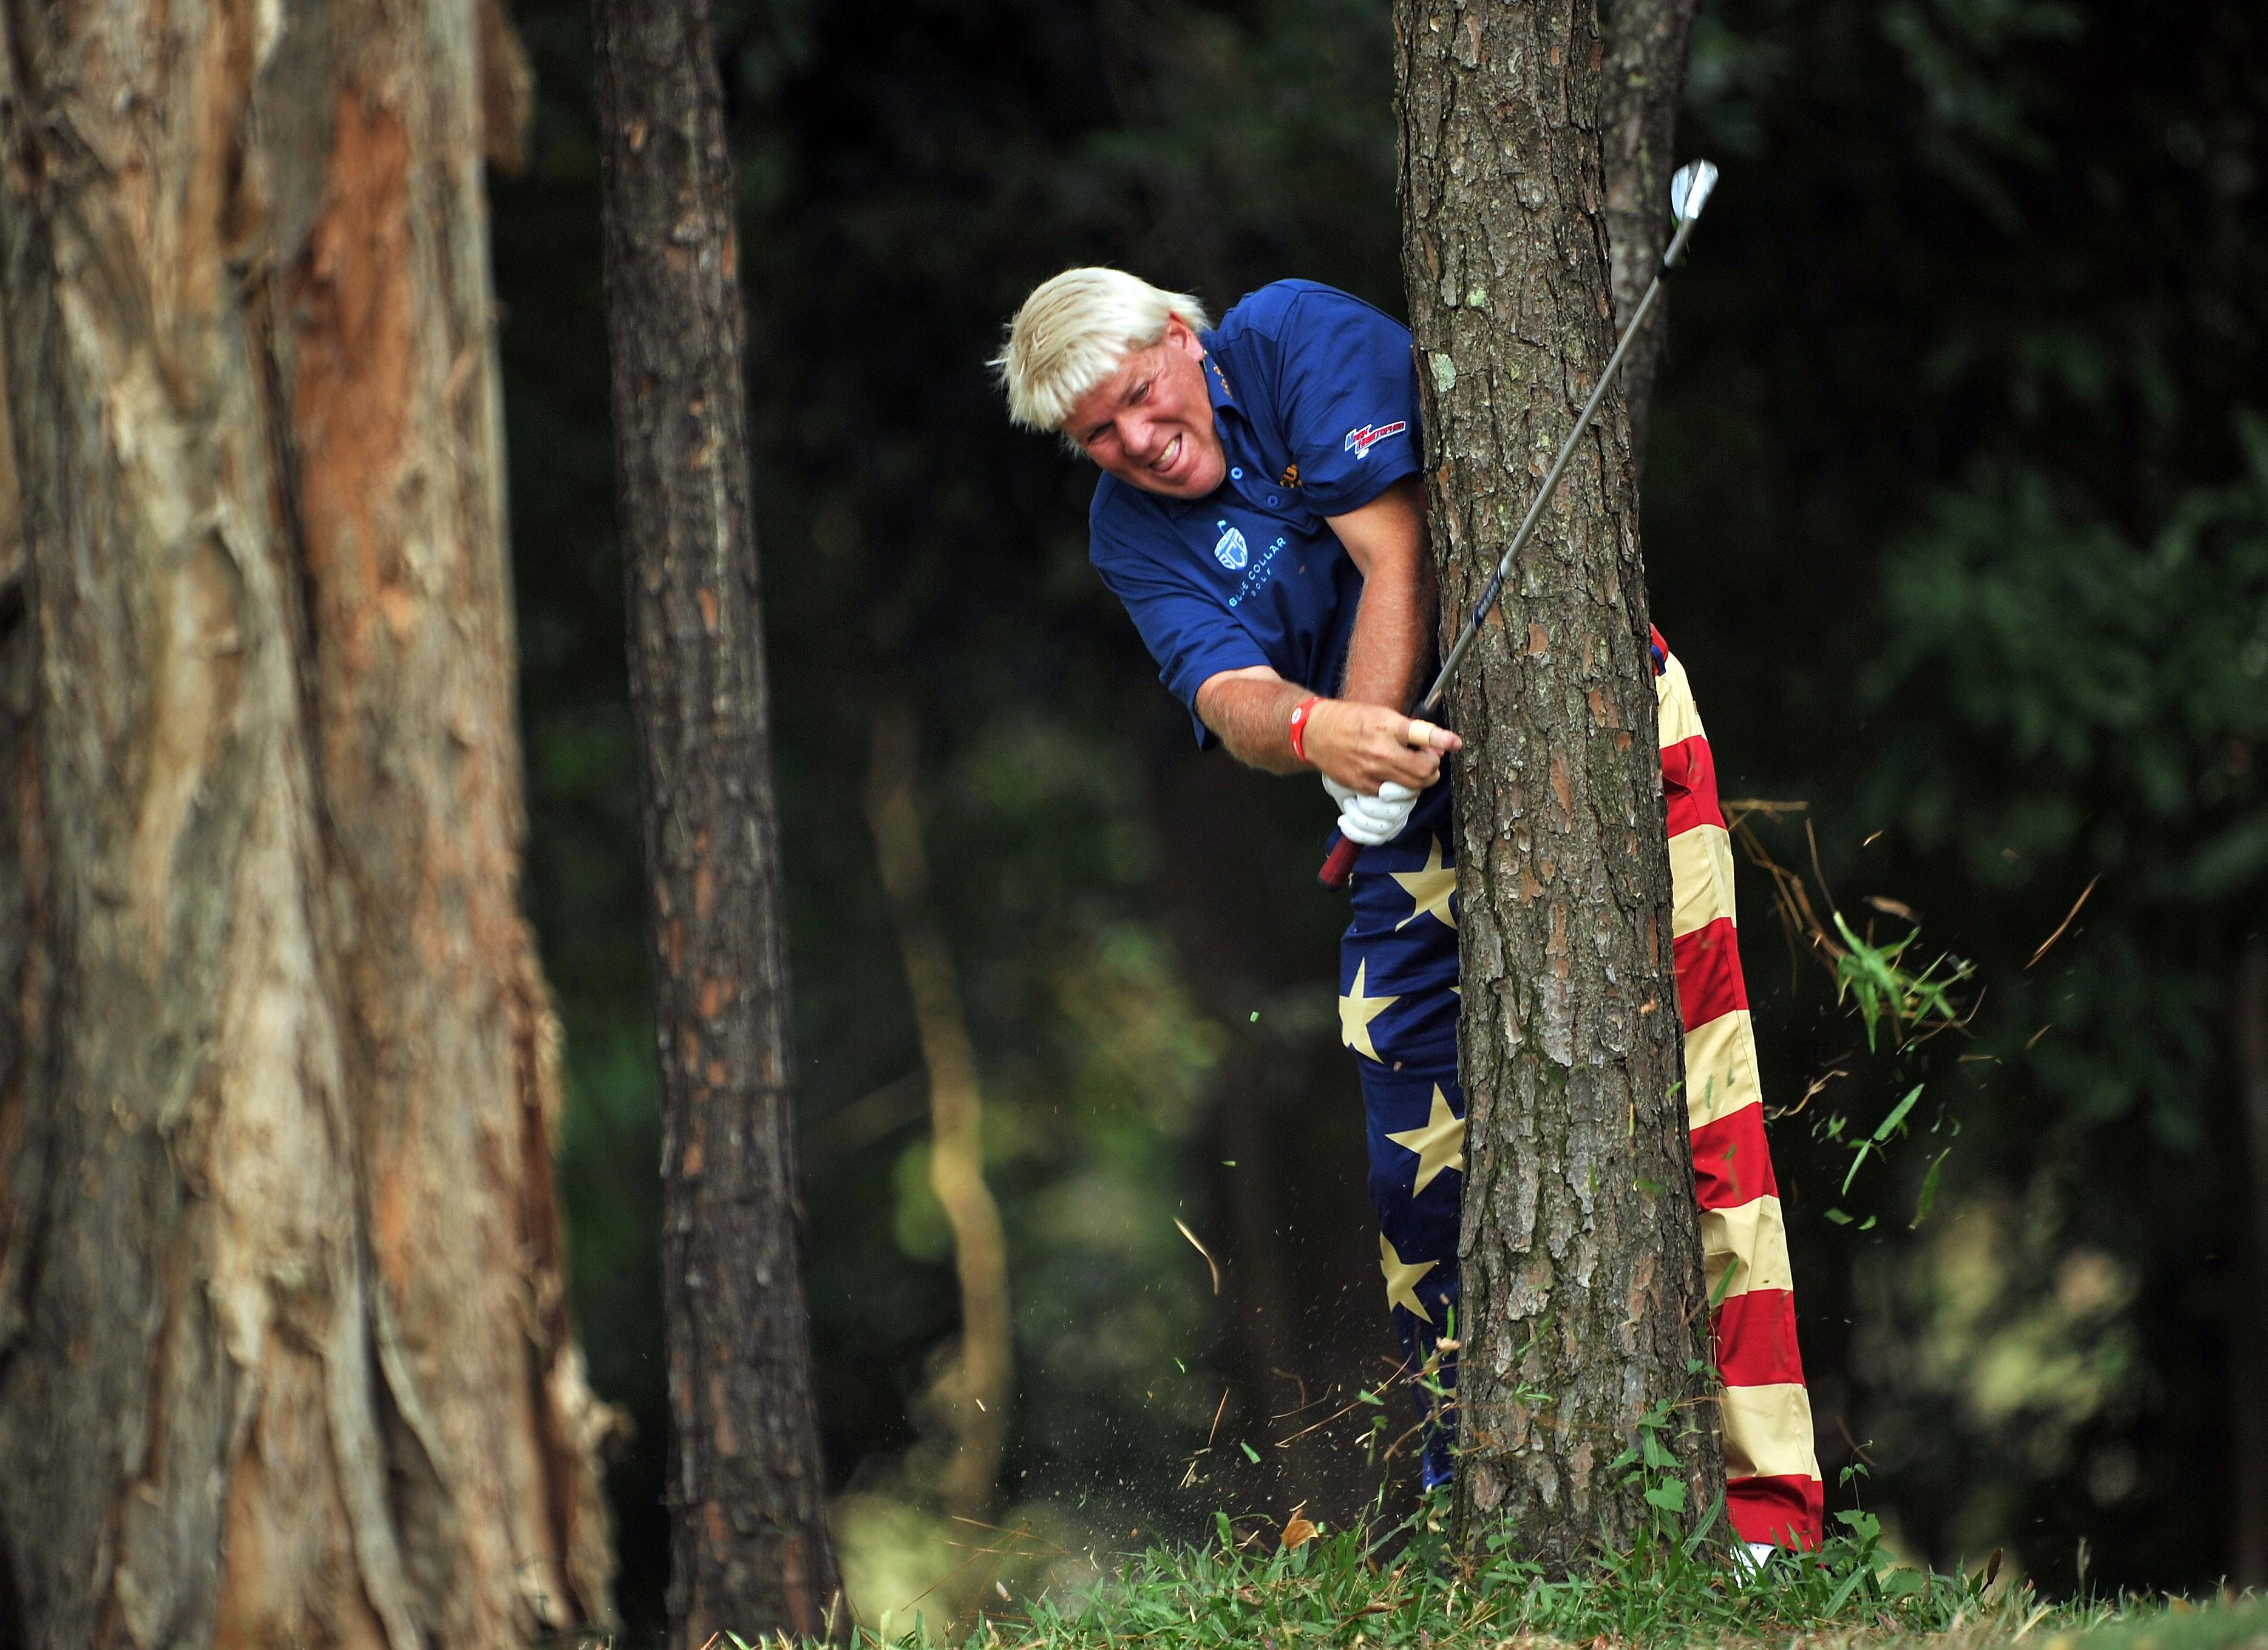 Golfer John Daly